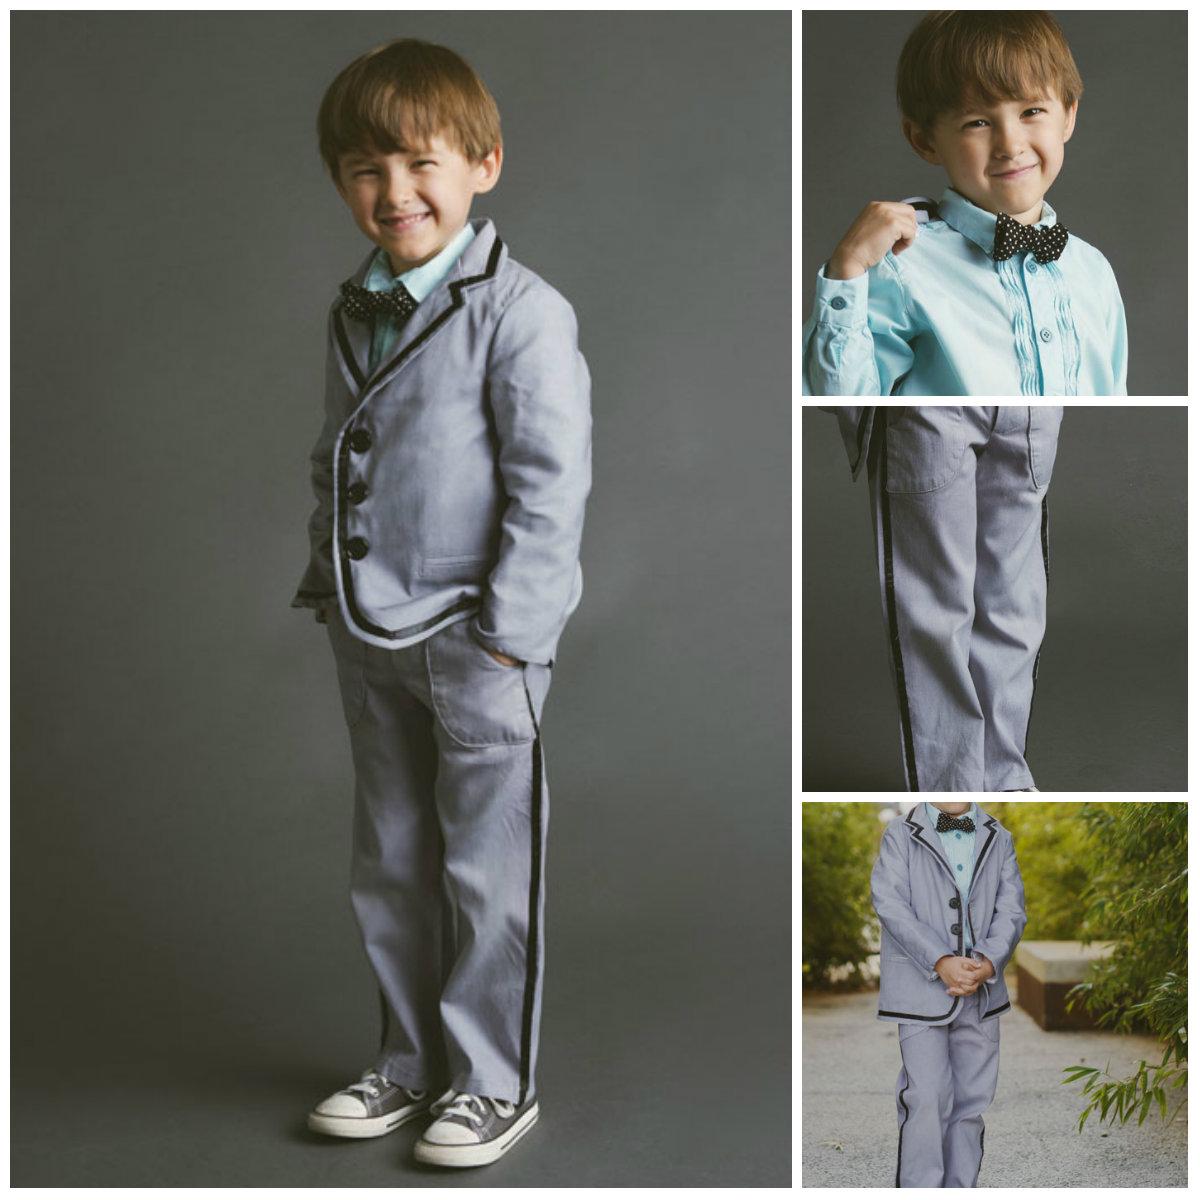 Blank Slate Child's Shirt and Pants Downloadable Pattern Trendy Tuxedo Shirt & Pants